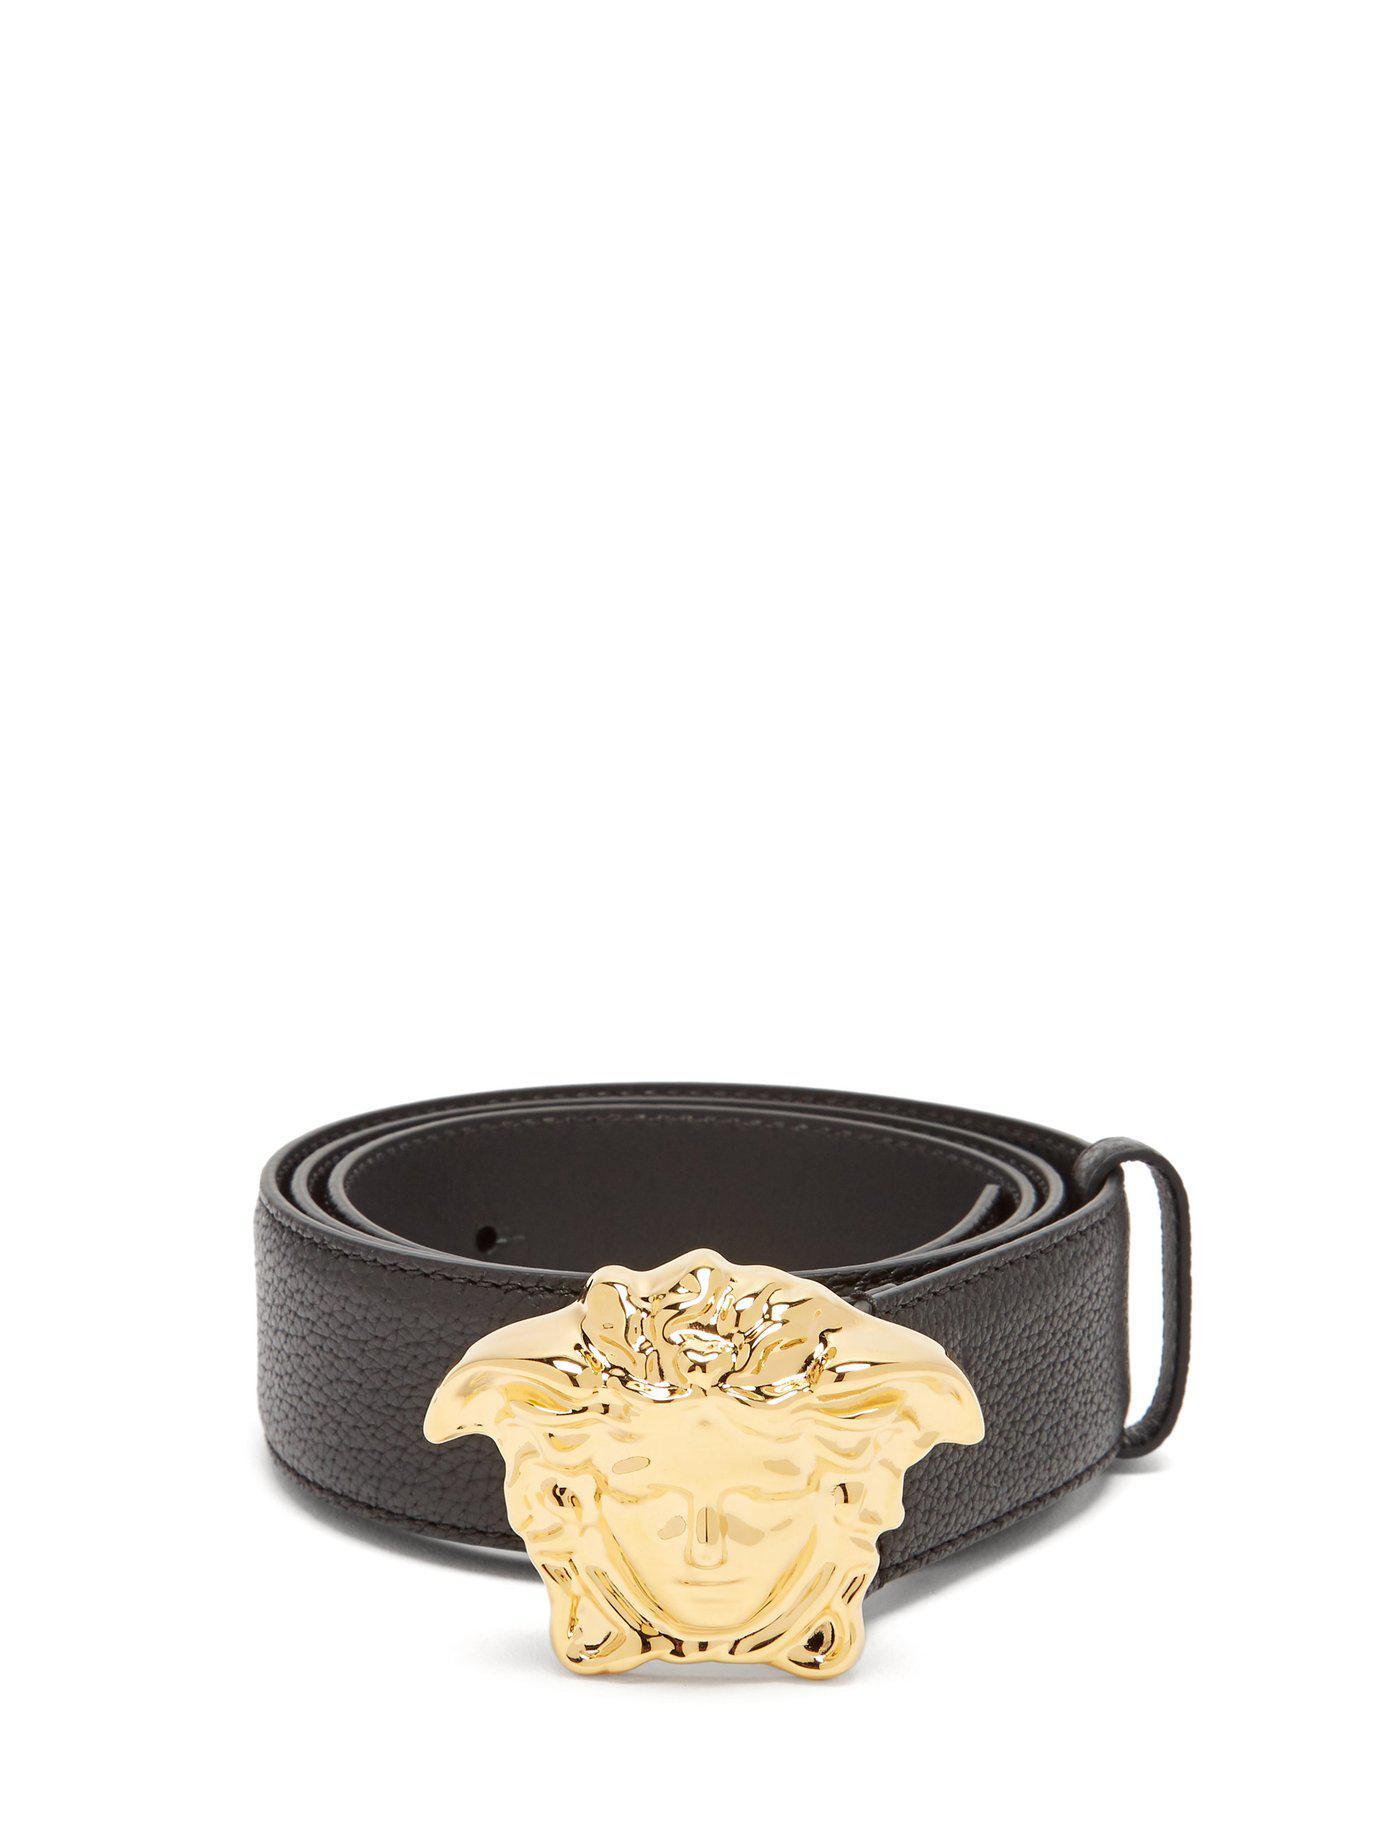 7209e810797d5 Lyst - Versace Medusa Buckle Leather Belt in Black for Men - Save 20%